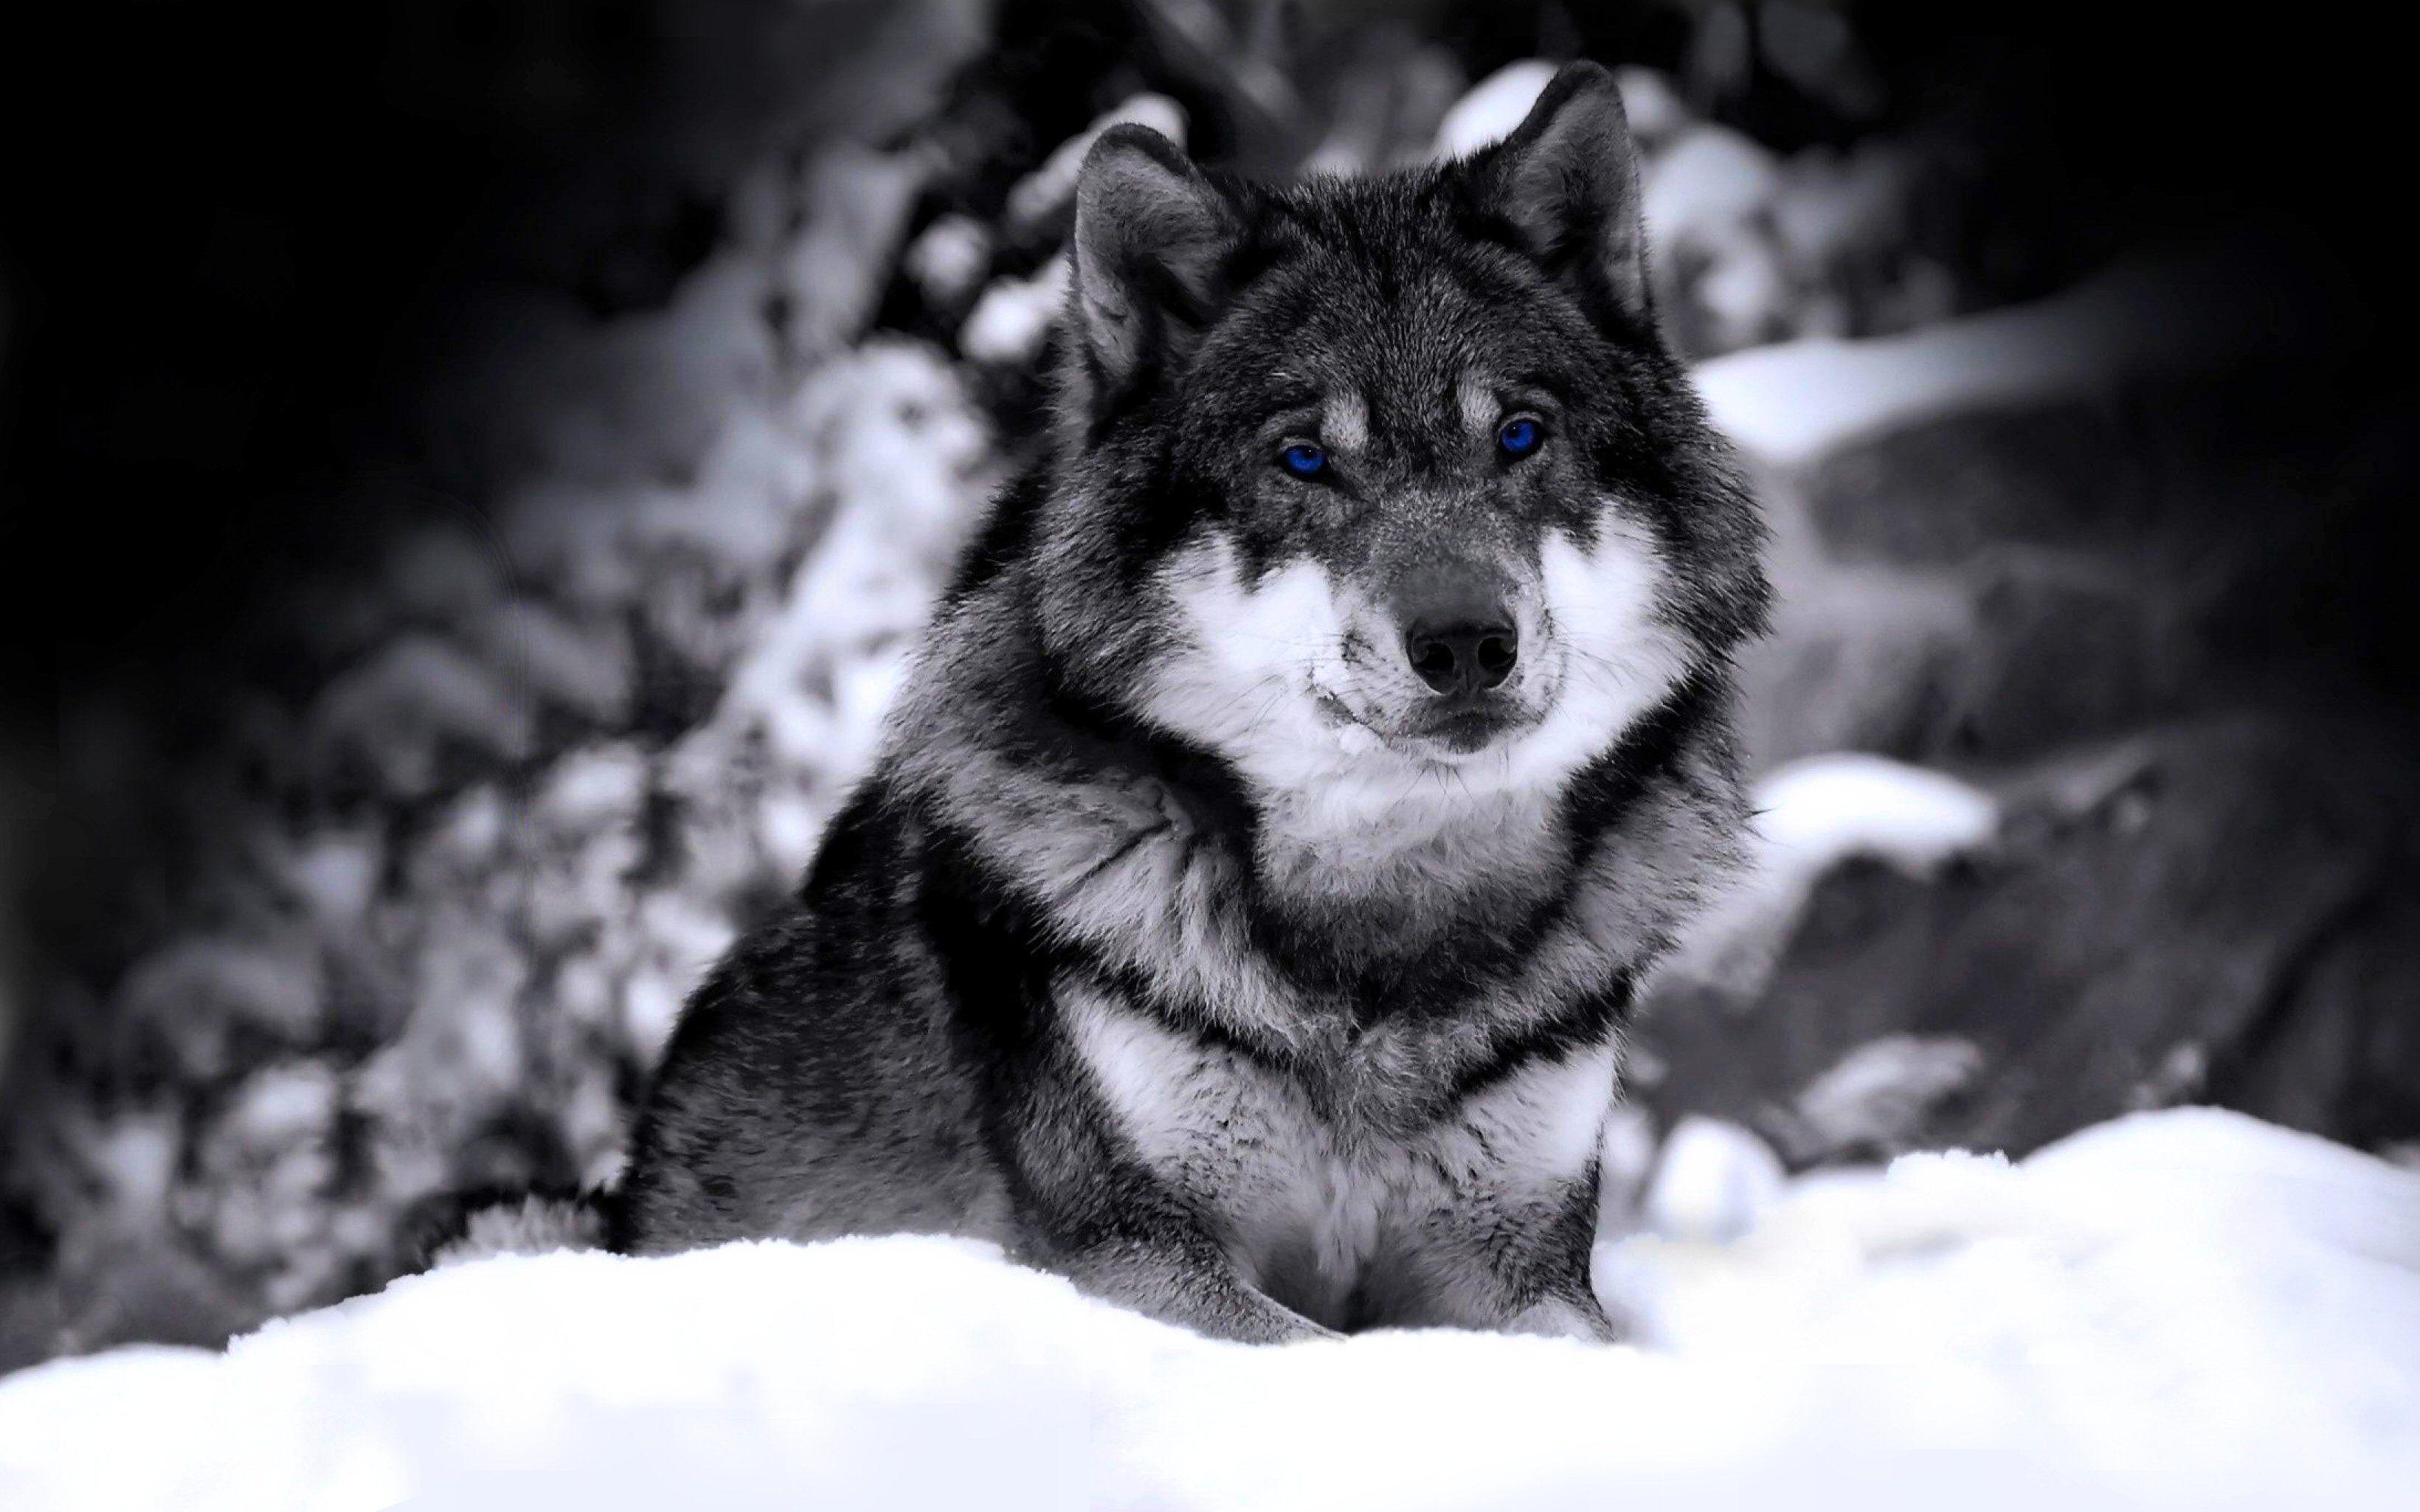 Wolf Desktop Wallpapers Top Free Wolf Desktop Backgrounds Wallpaperaccess